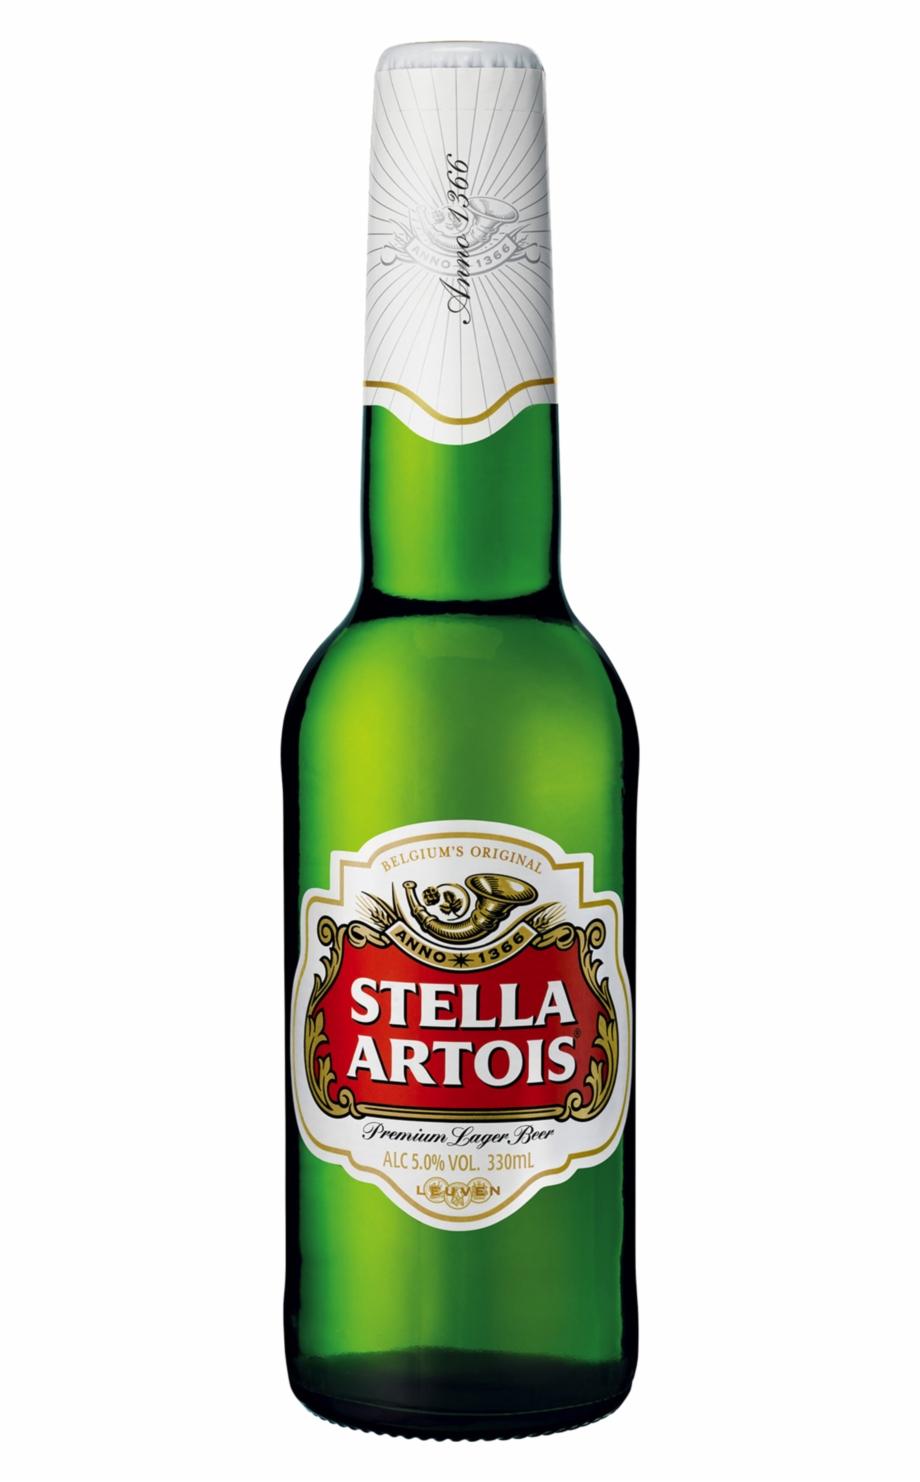 Stella Artois Beer Bottle.